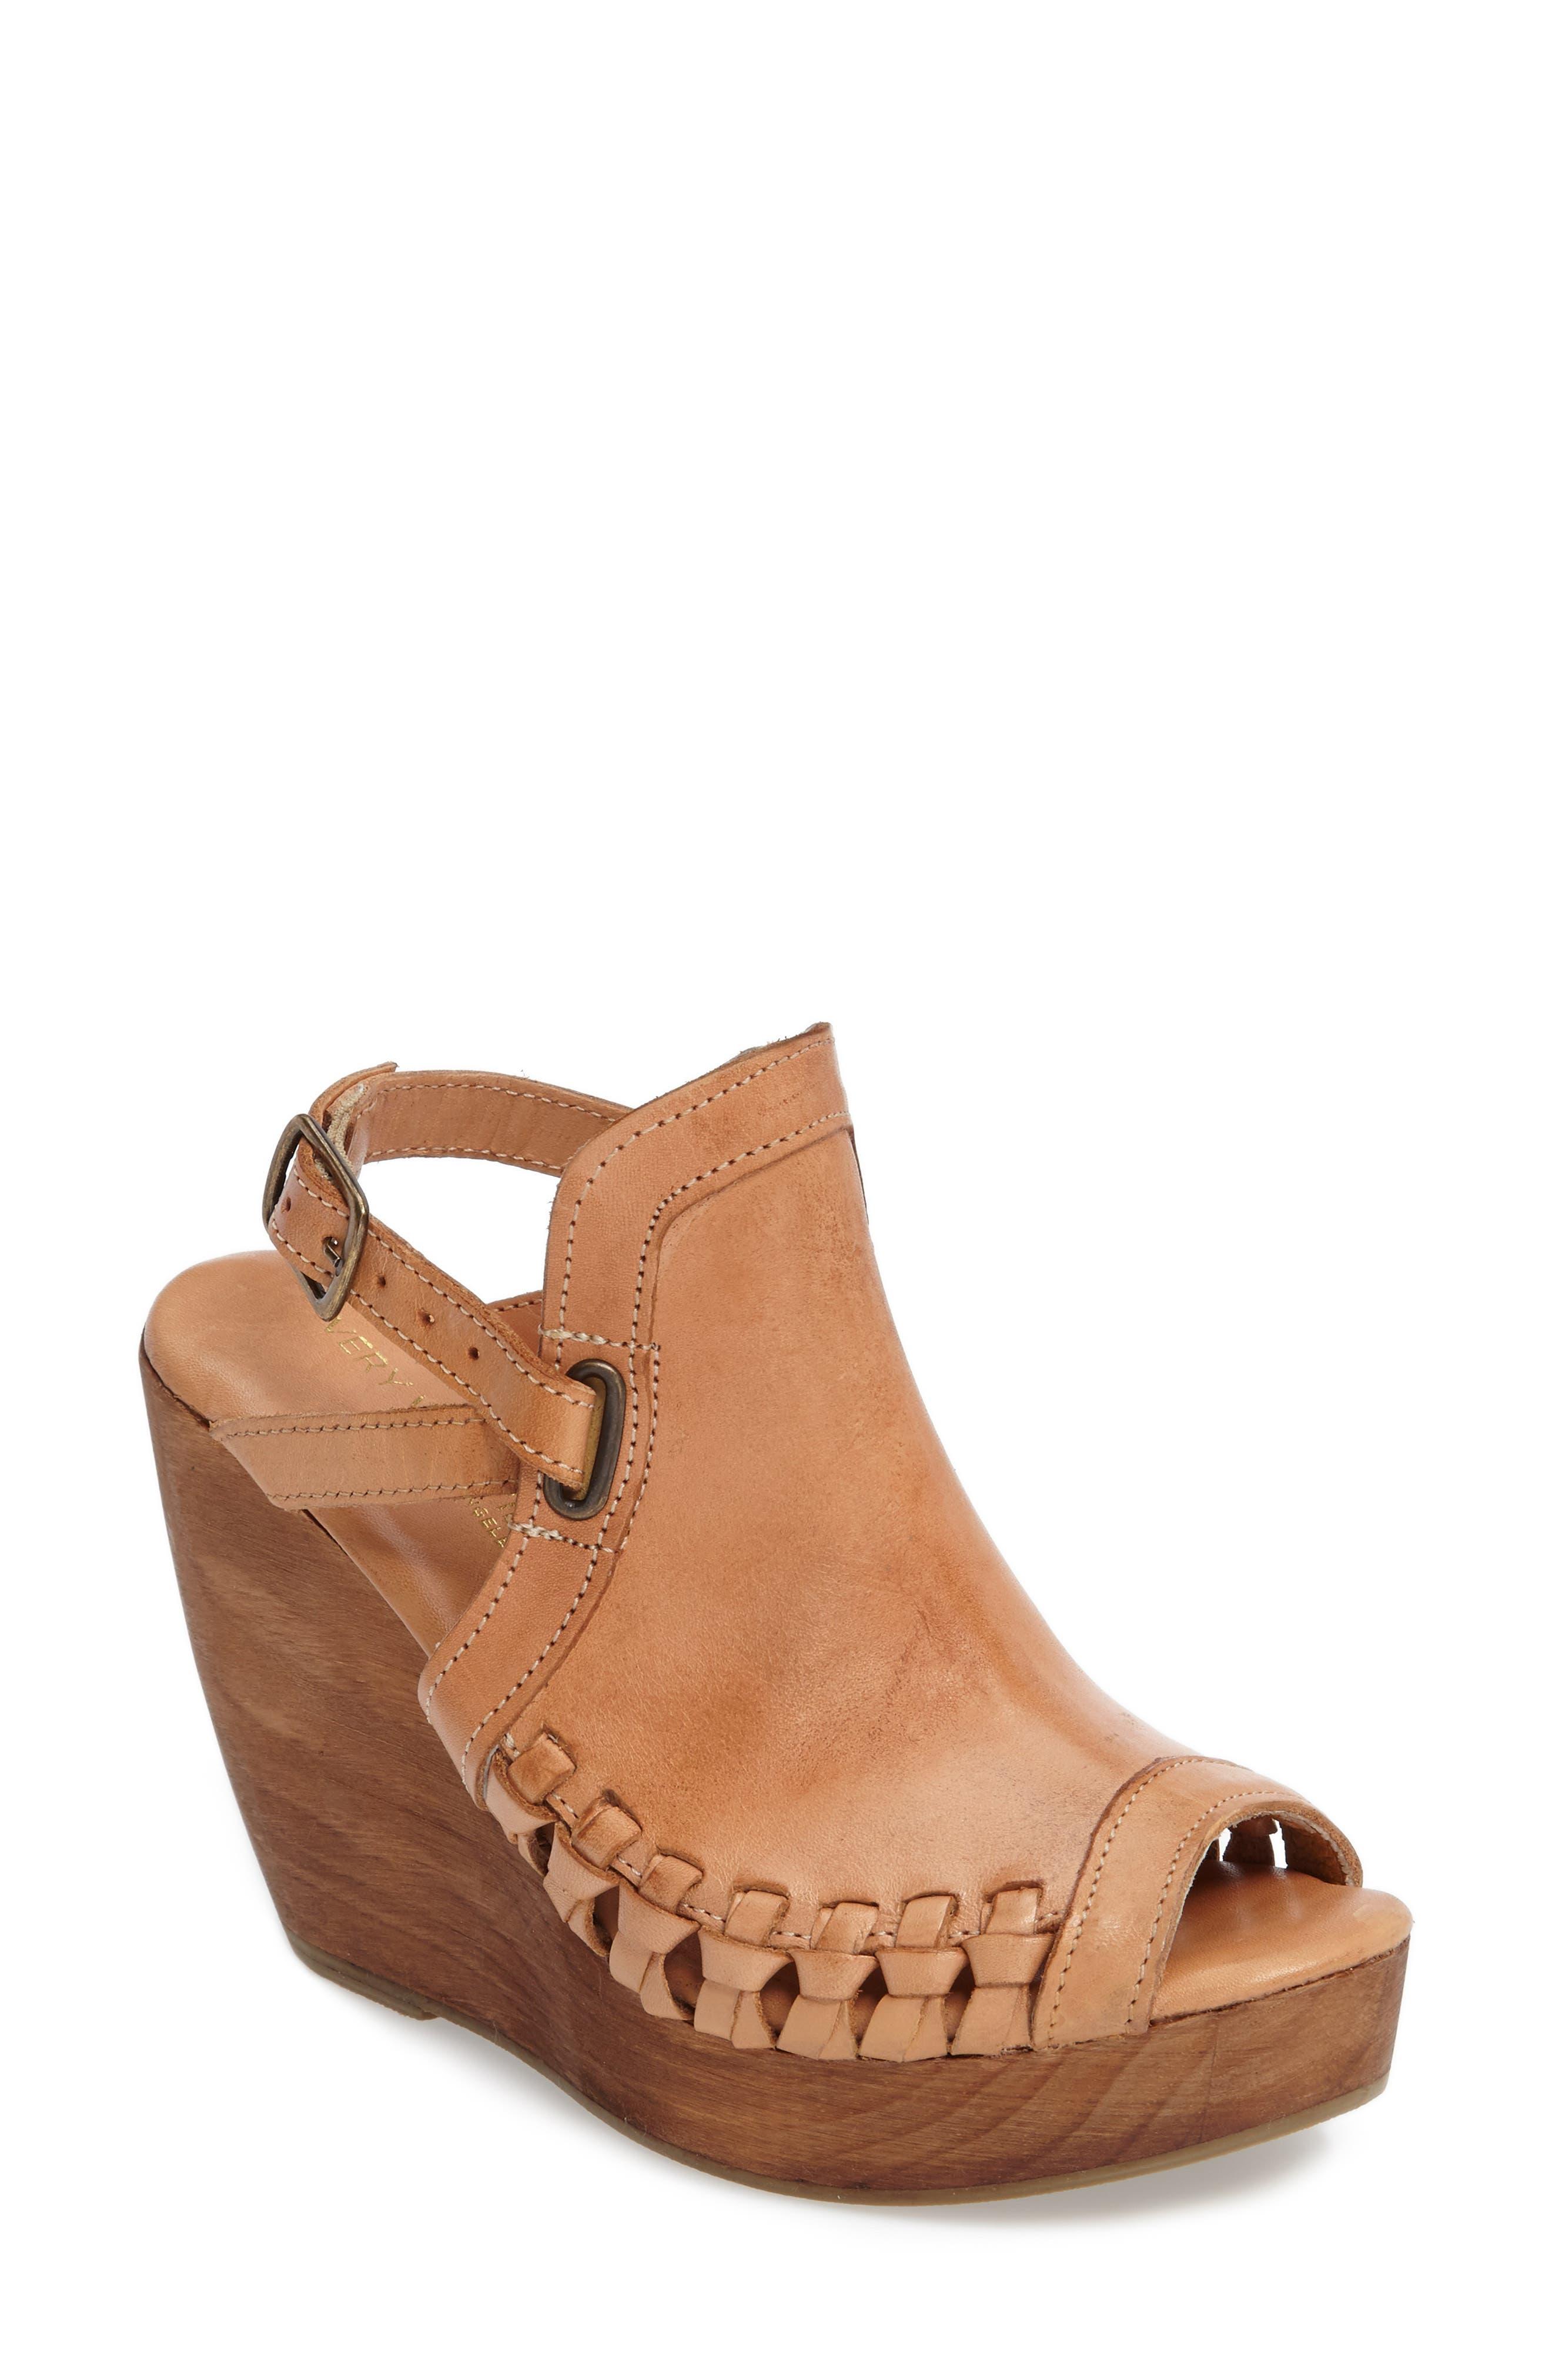 Main Image - Very Volatile Carry Wedge Sandal (Women)